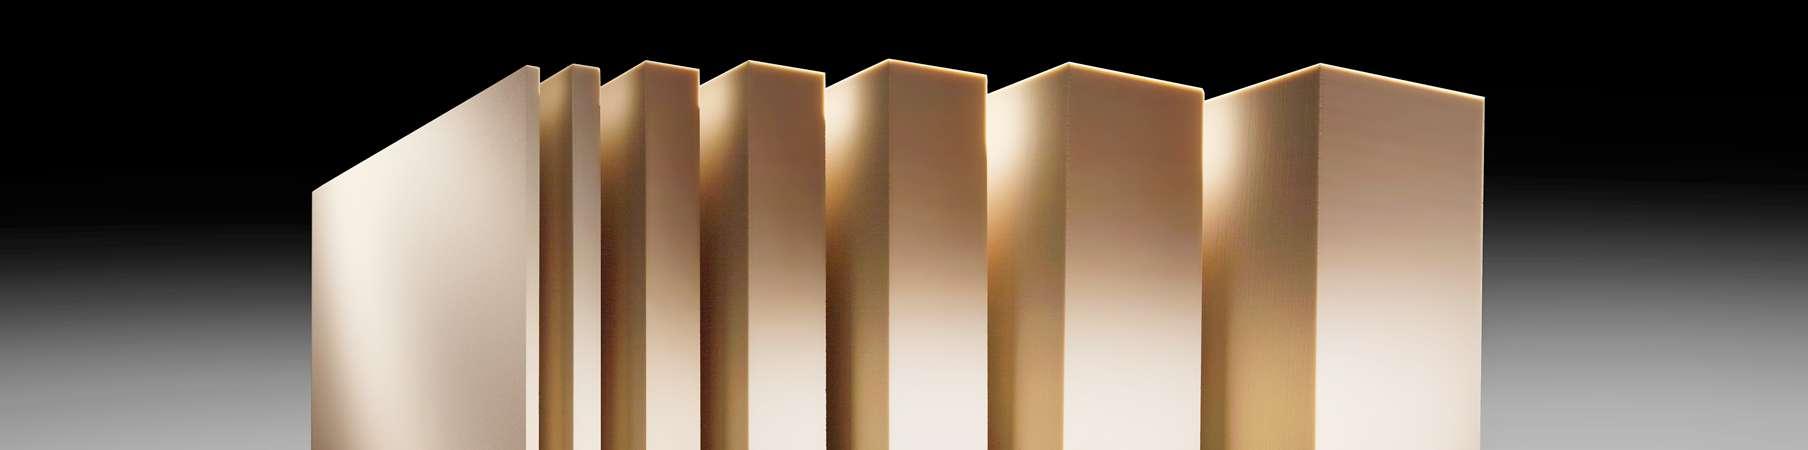 Rigid And Flexible Polyurethane Foam Products | General Plastics